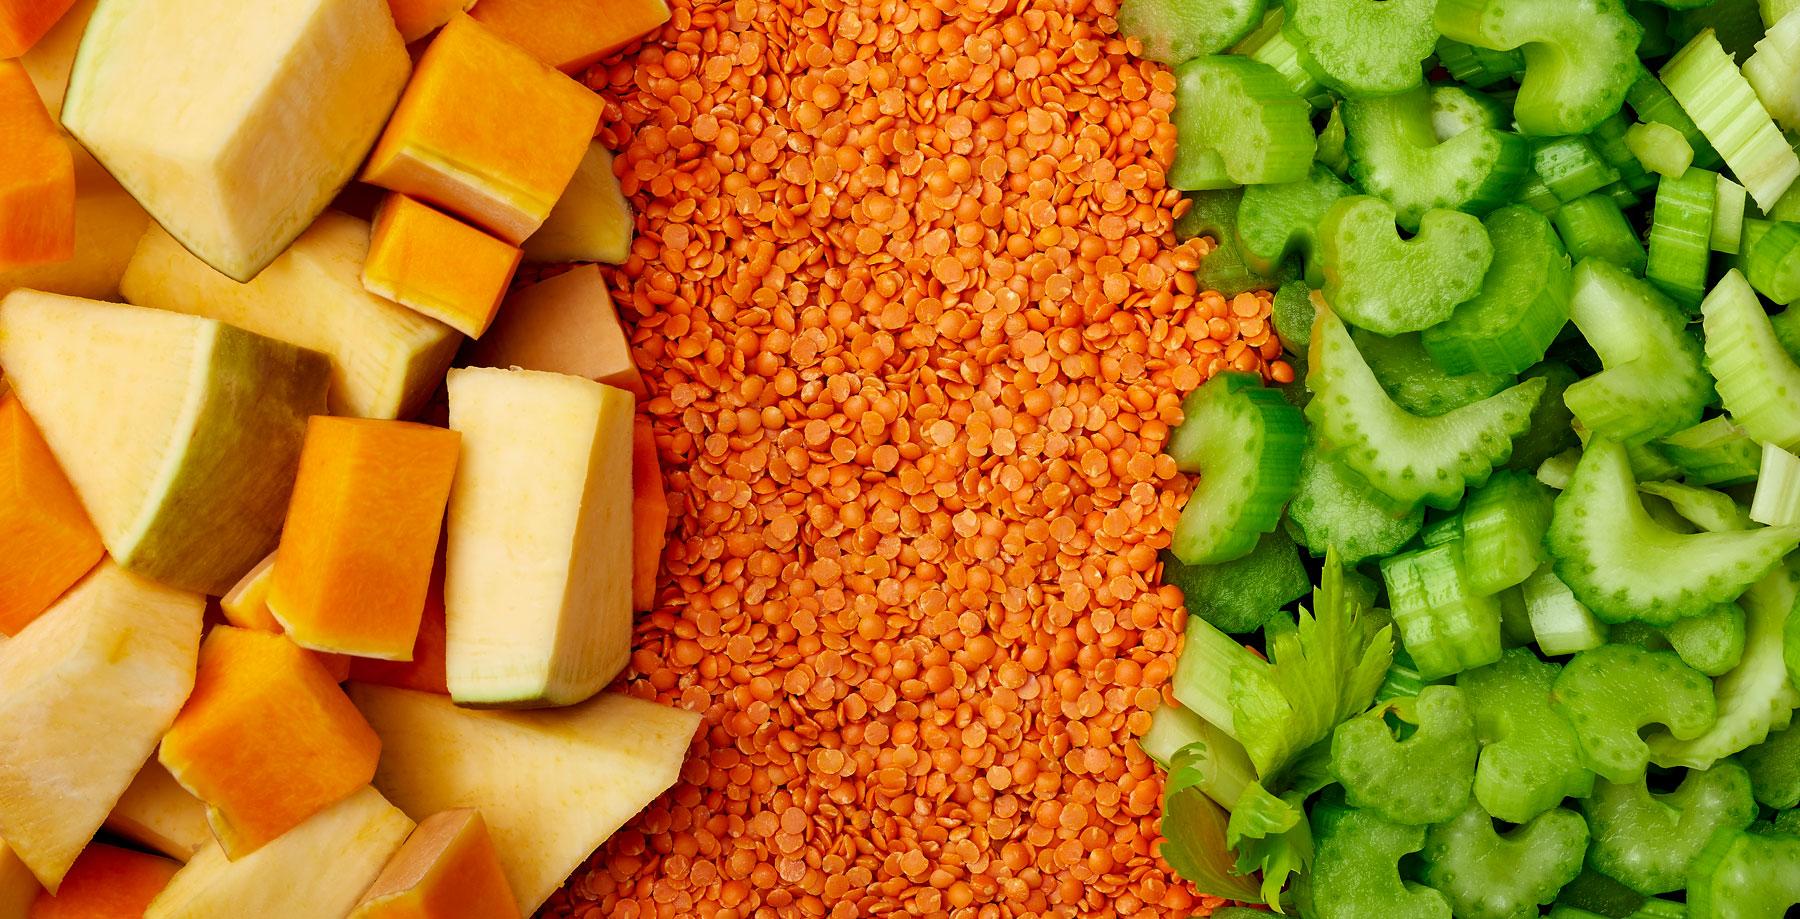 Butternut squash, lentils and celery